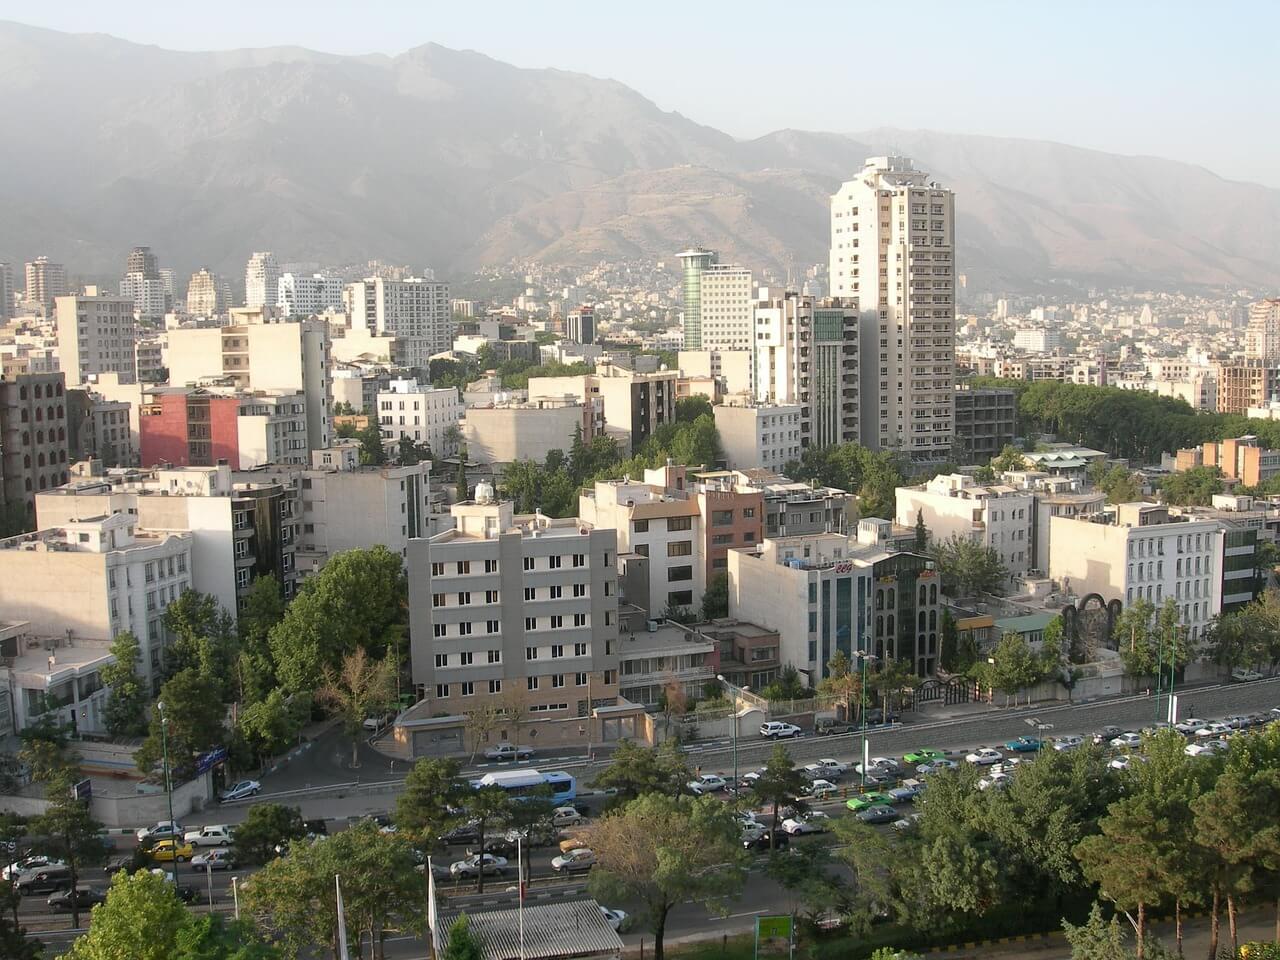 Die TOP 10-Sehenswürdigkeiten in Teheran